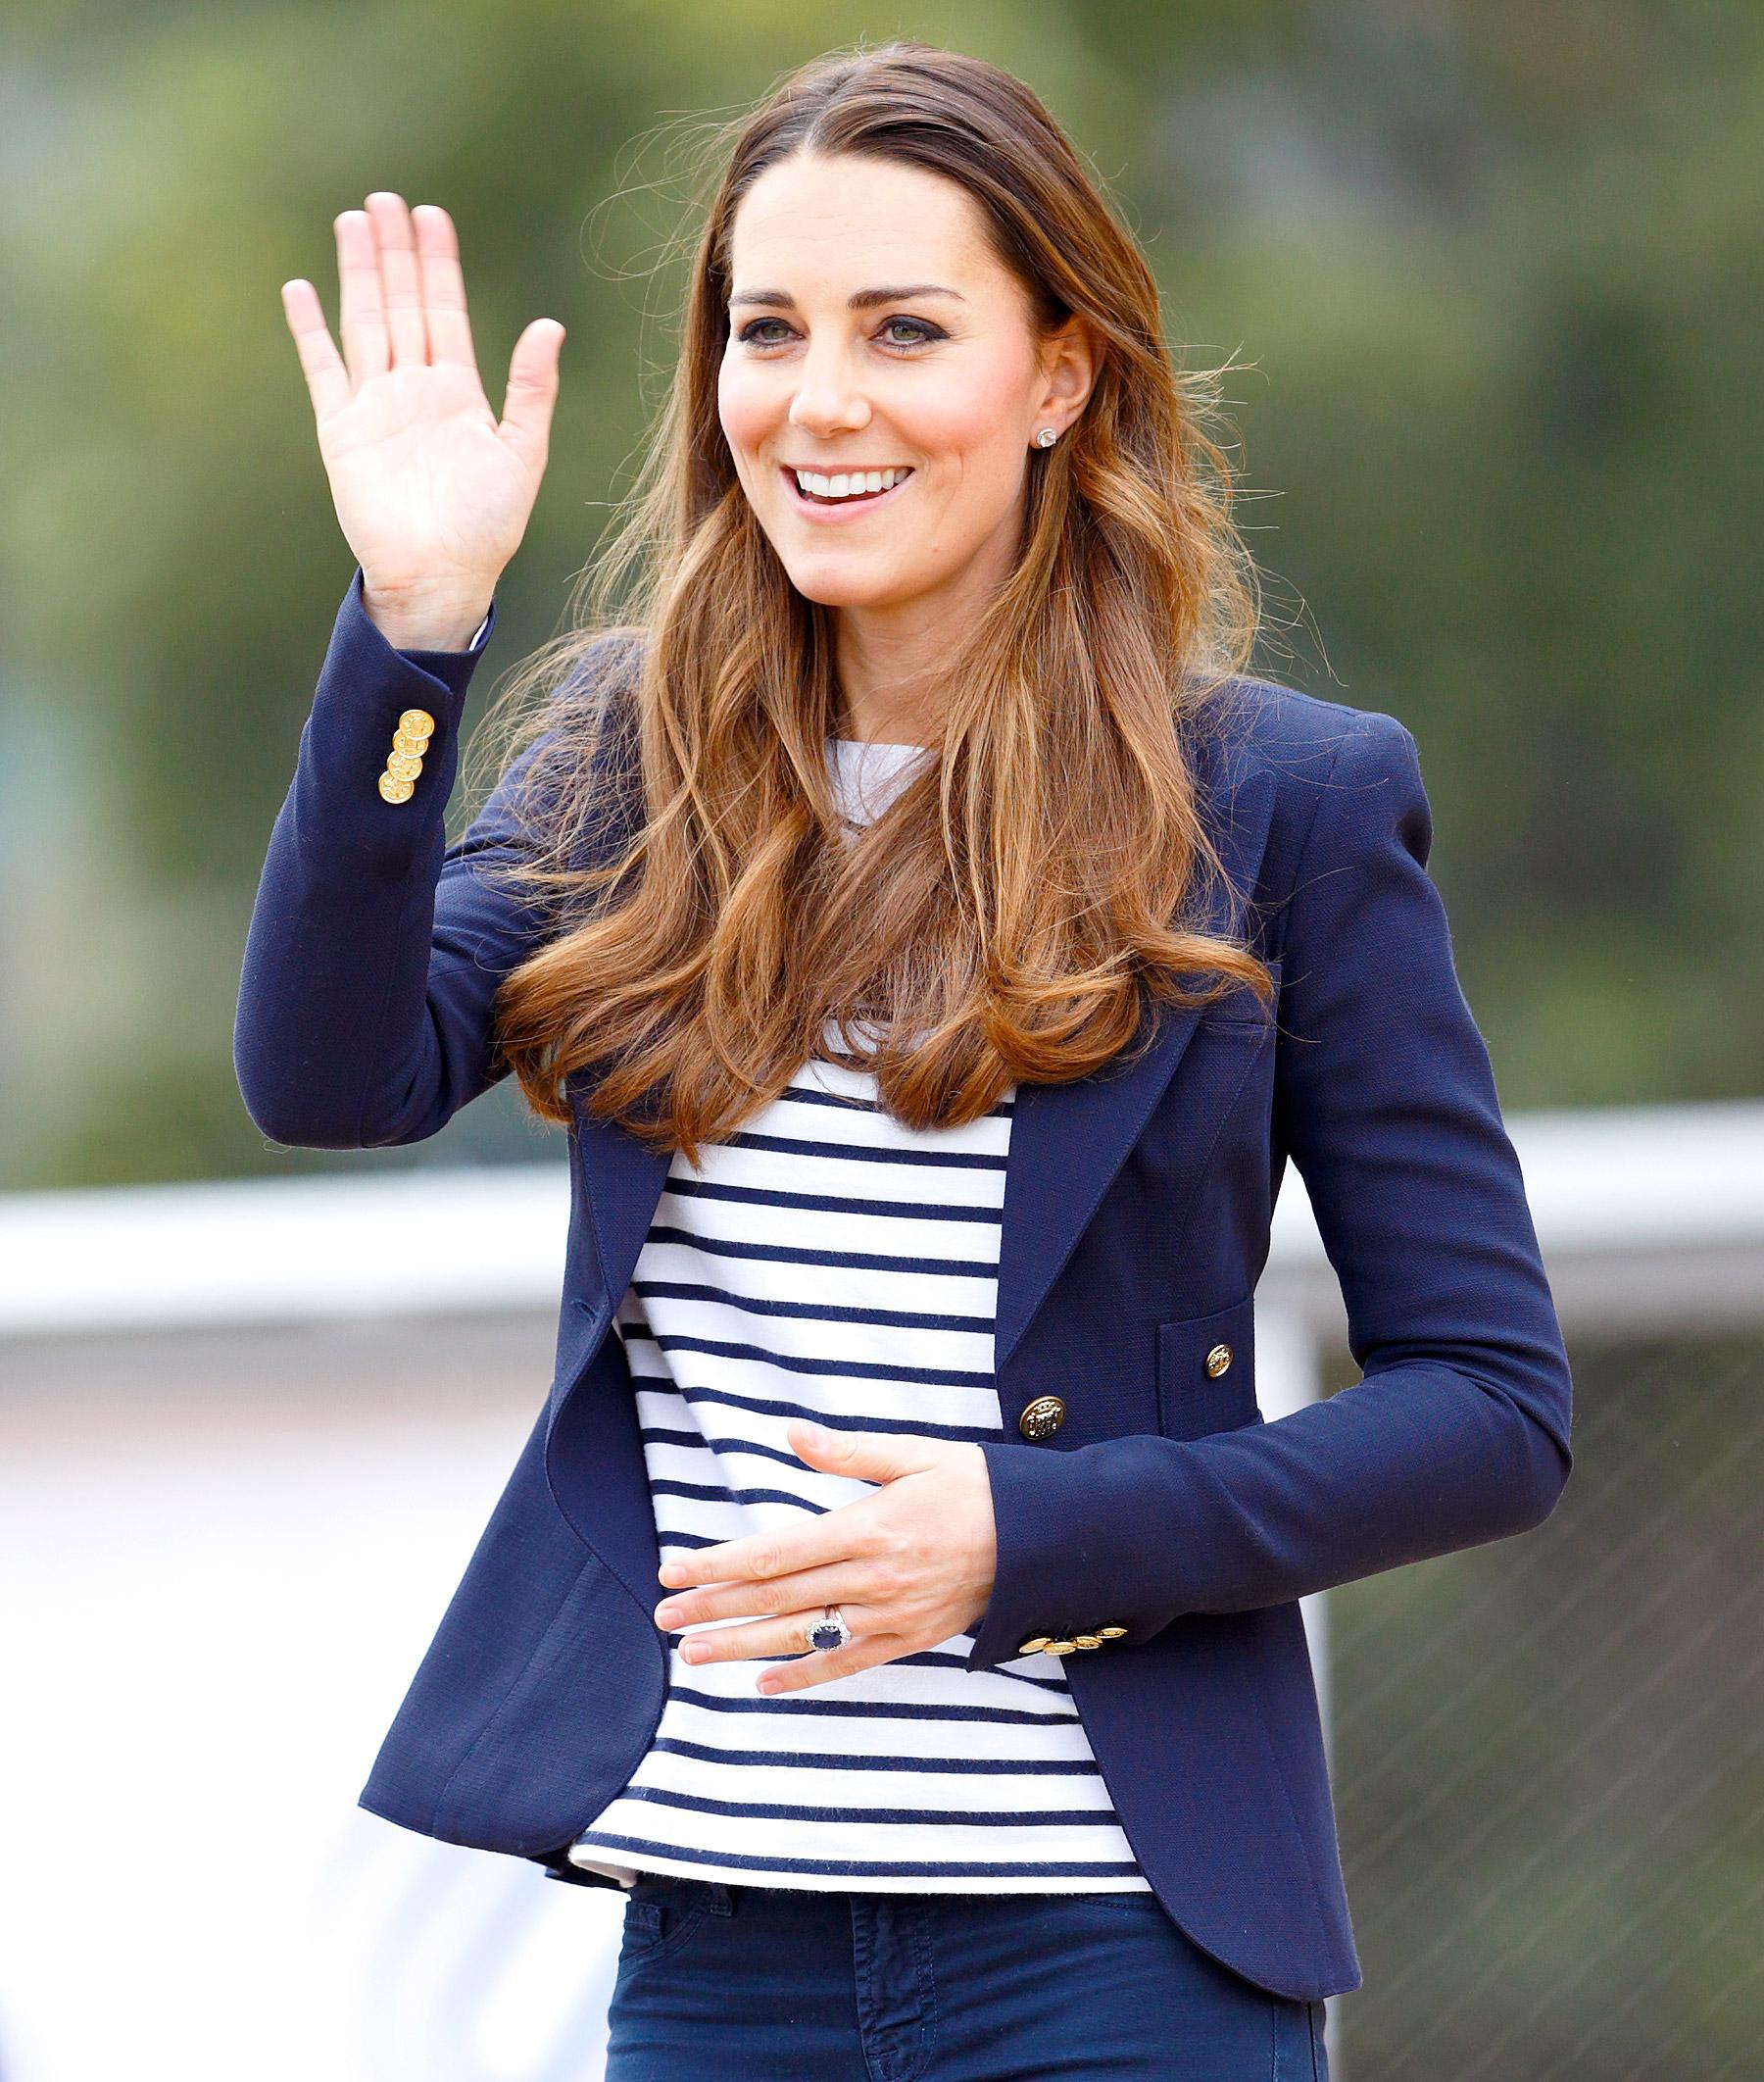 Katalin hercegné 2013-ban, Londonban